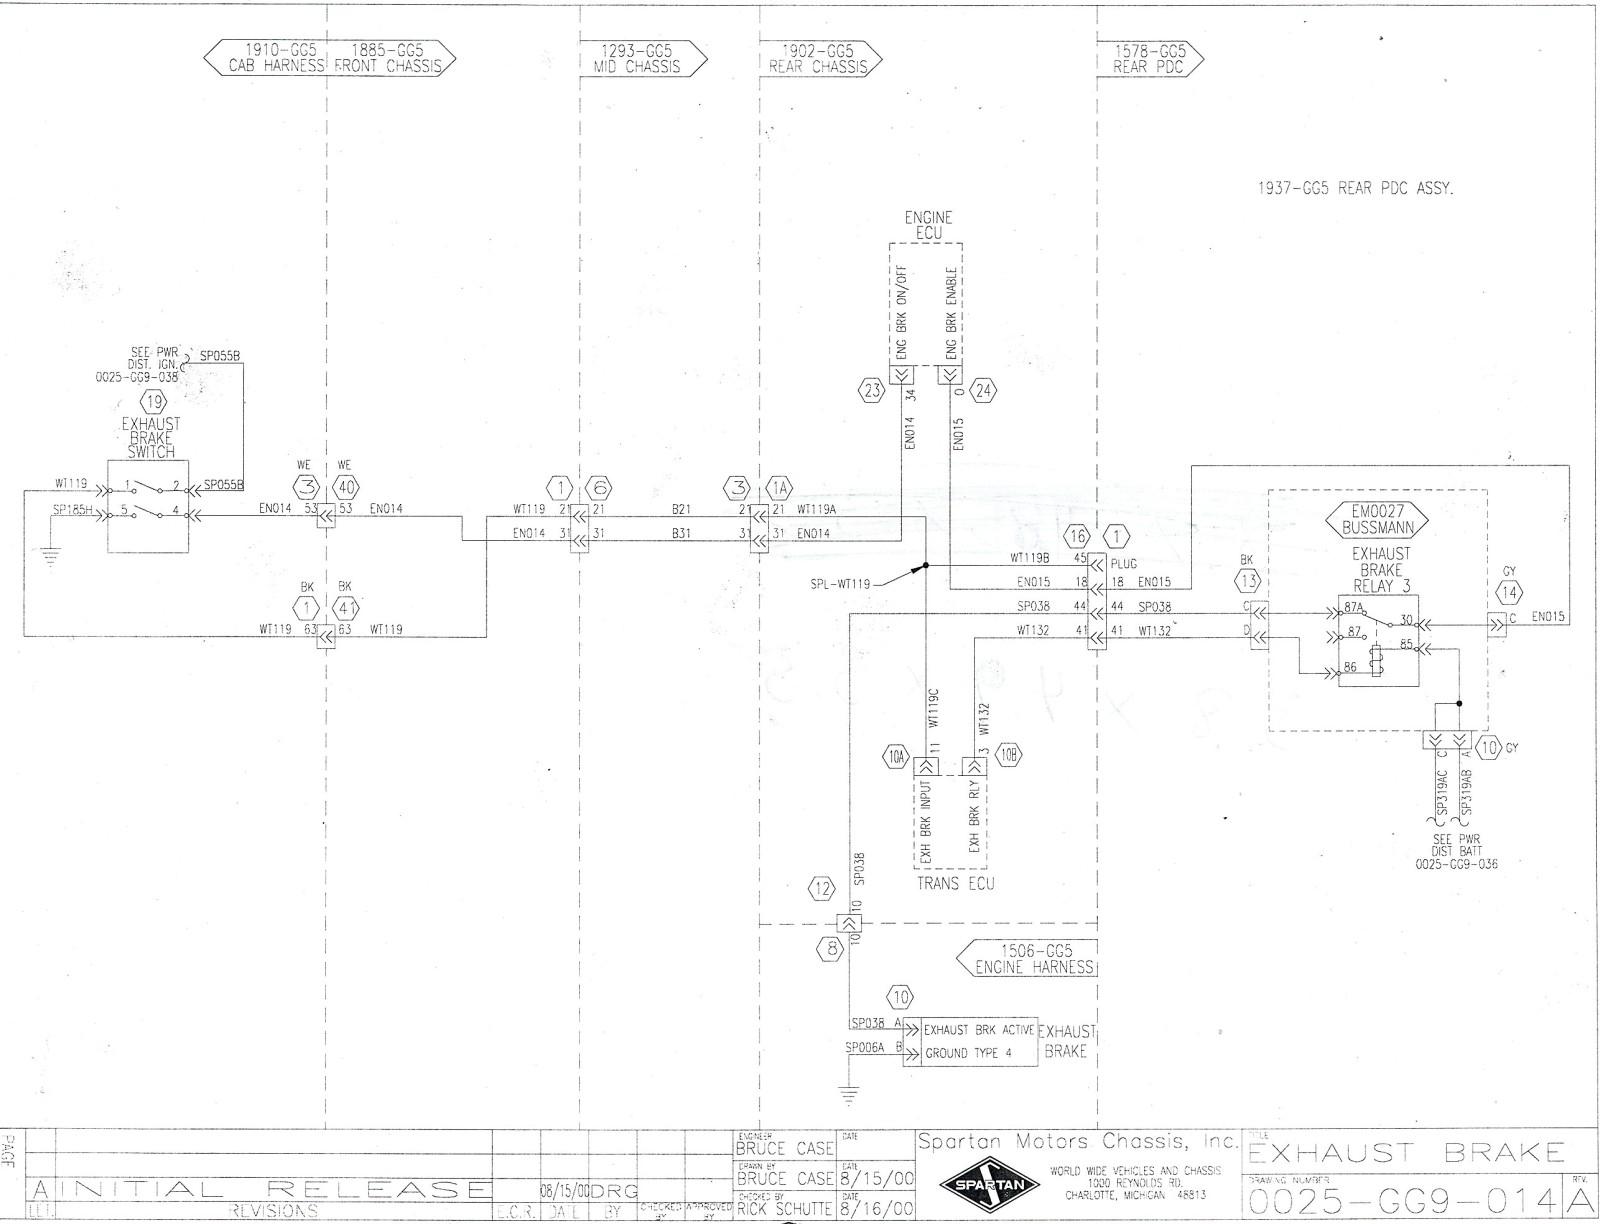 2000 subaru legacy fuse box diagram  subaru  auto wiring